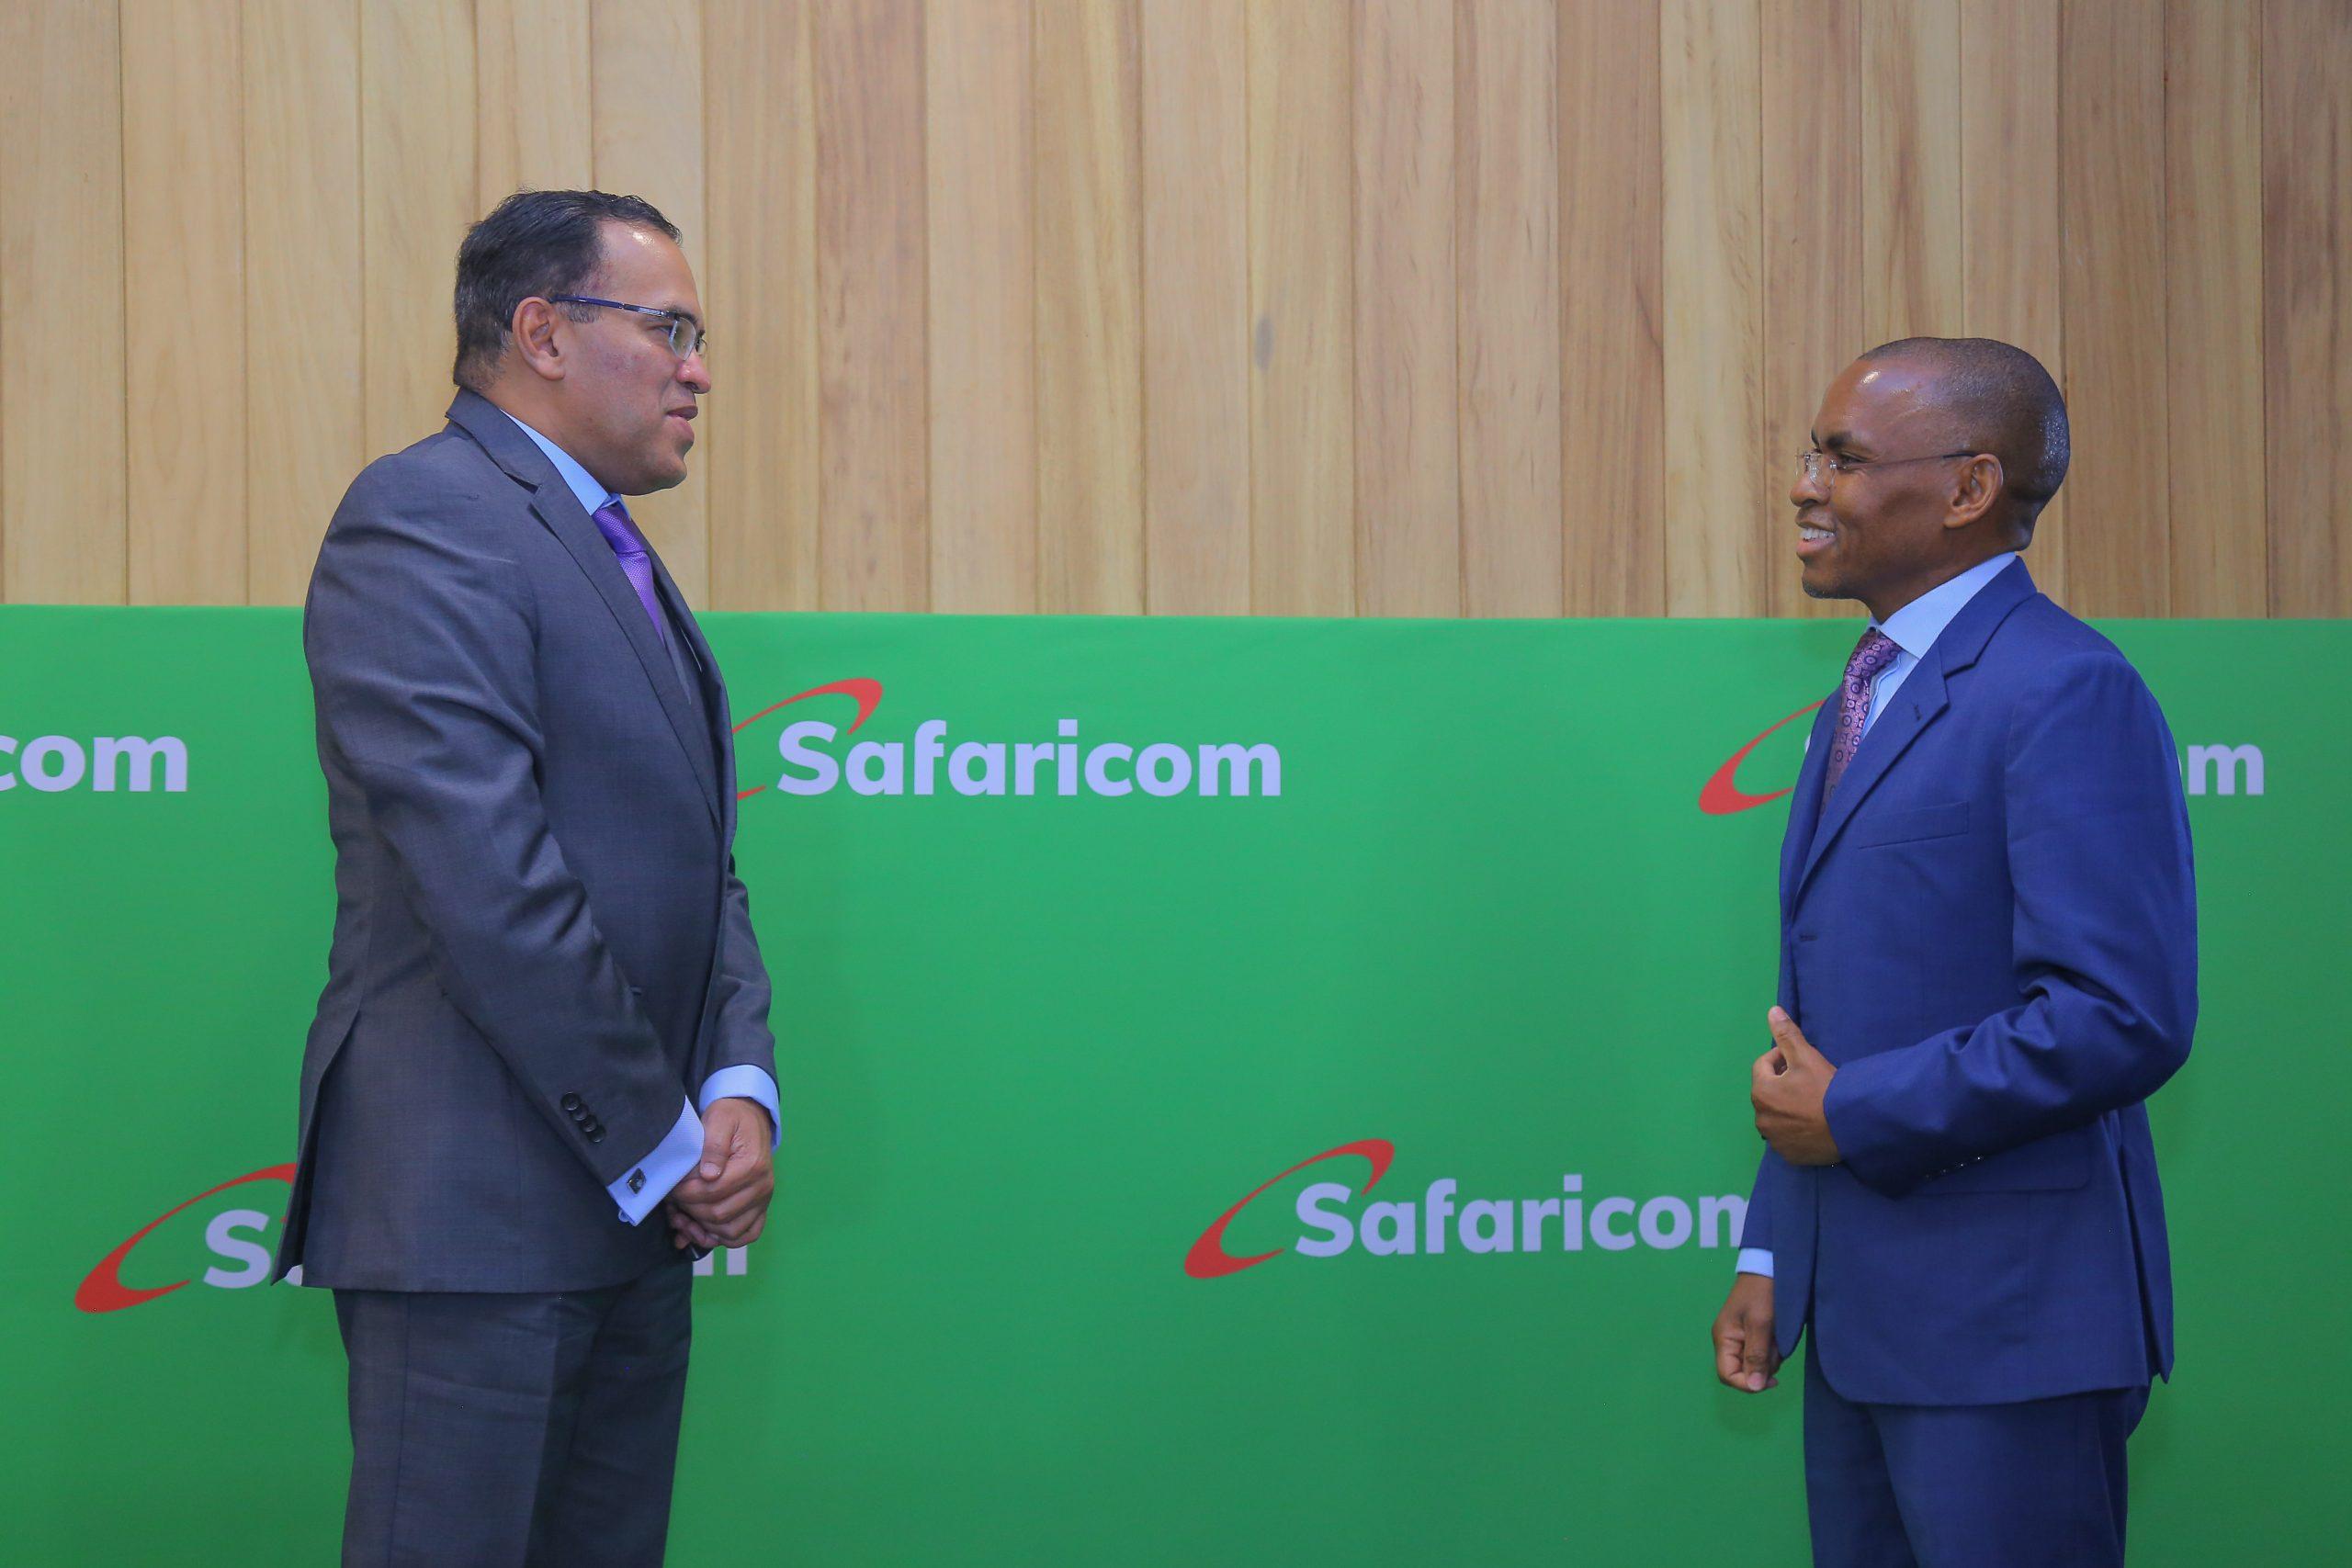 Podcast; Interview with Safaricom CEO Peter Ndegwa & CFO Sateesh Kamath - Kenyan Wallstreet